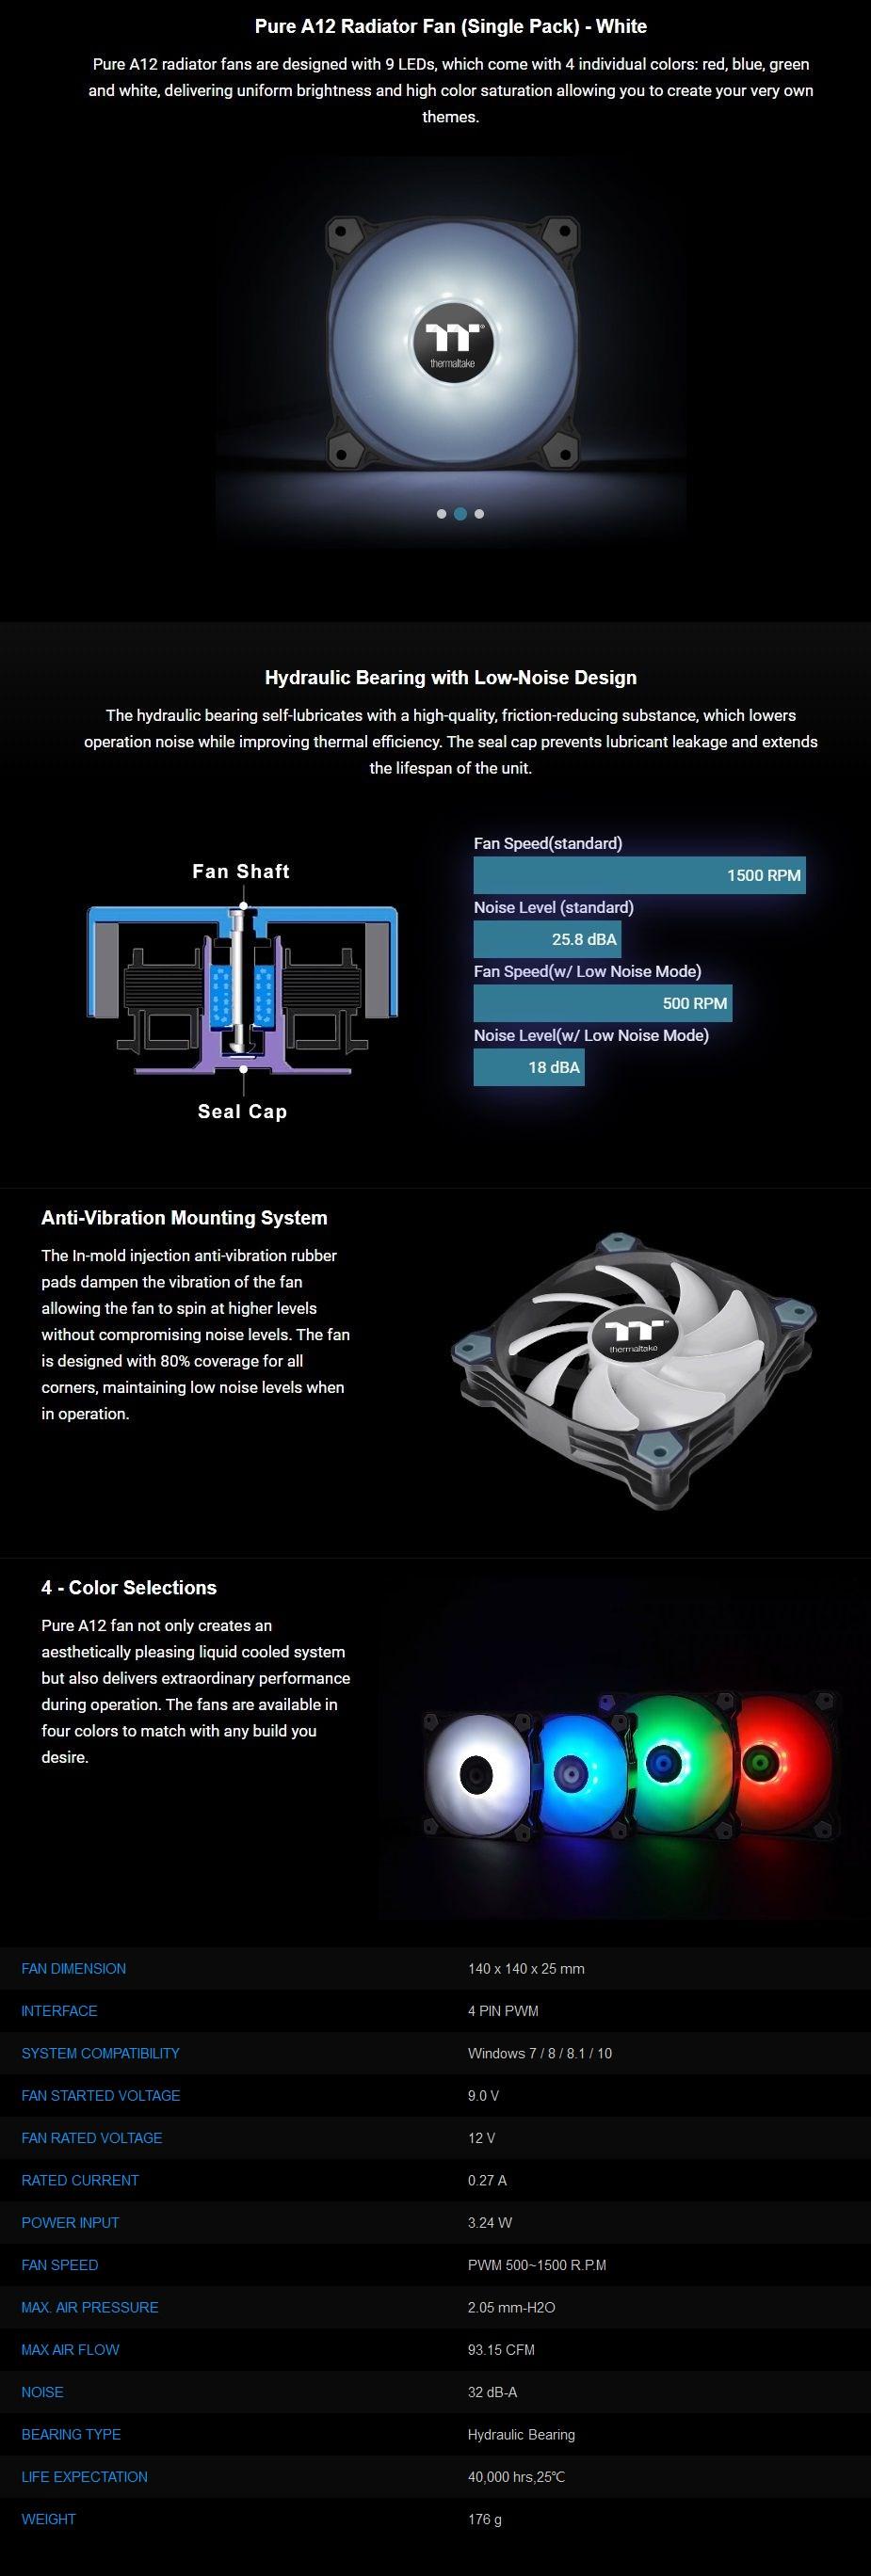 thermaltake-pure-a12-120mm-led-radiator-fan-white-ac37133-2-.jpg